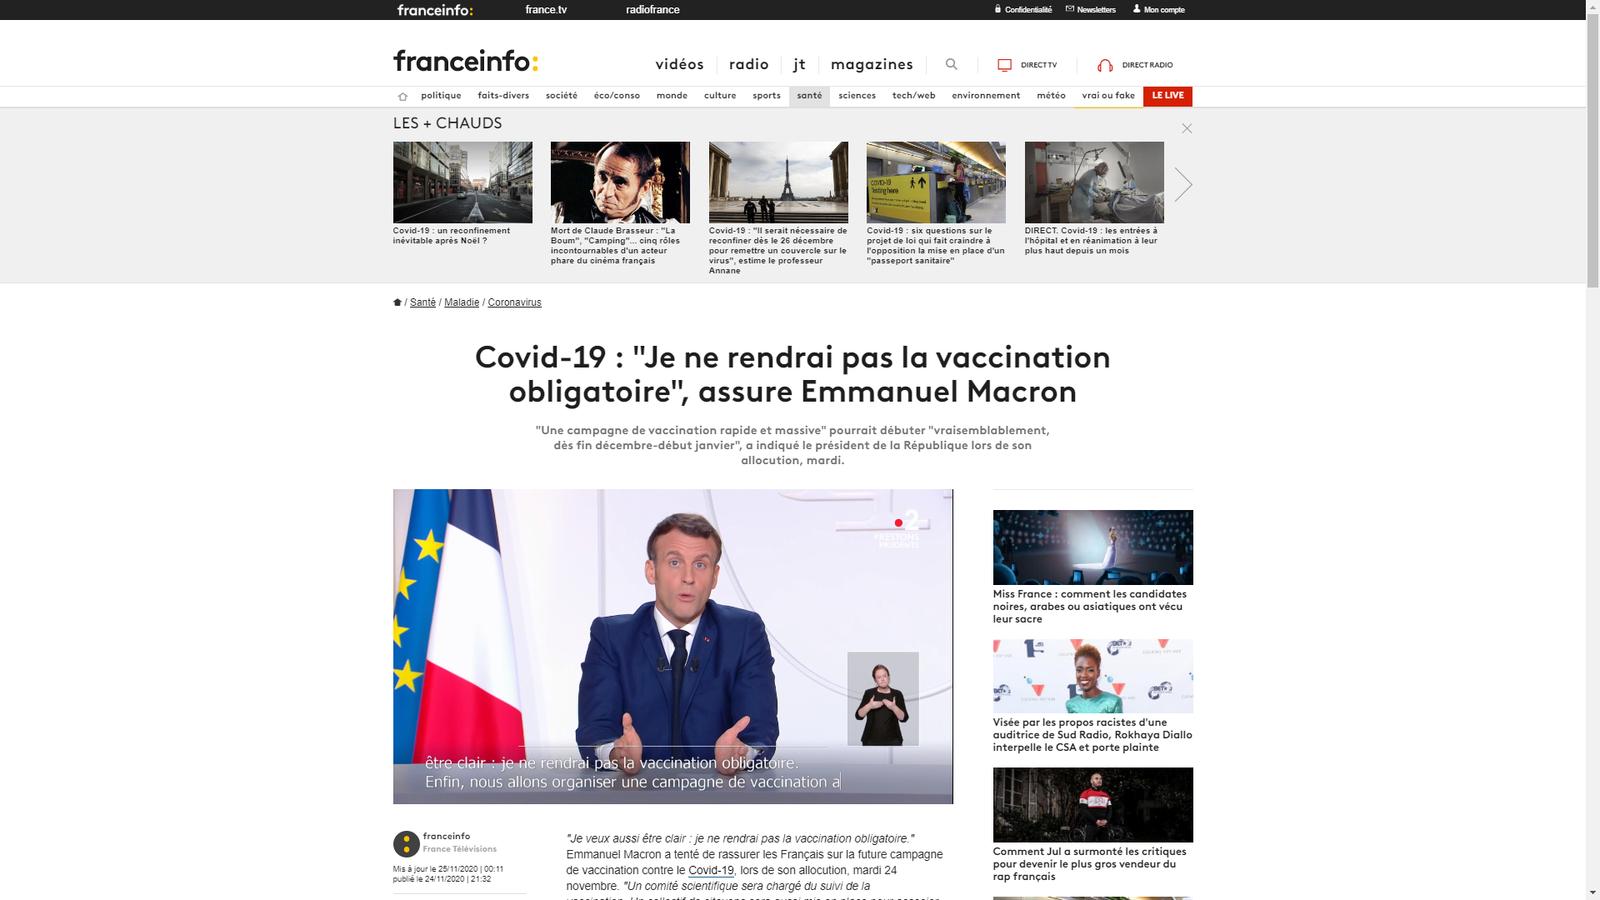 https://www.francetvinfo.fr/sante/maladie/coronavirus/covid-19-je-ne-rendrai-pas-la-vaccination-obligatoire-assure-emmanuel-macron_4194231.html